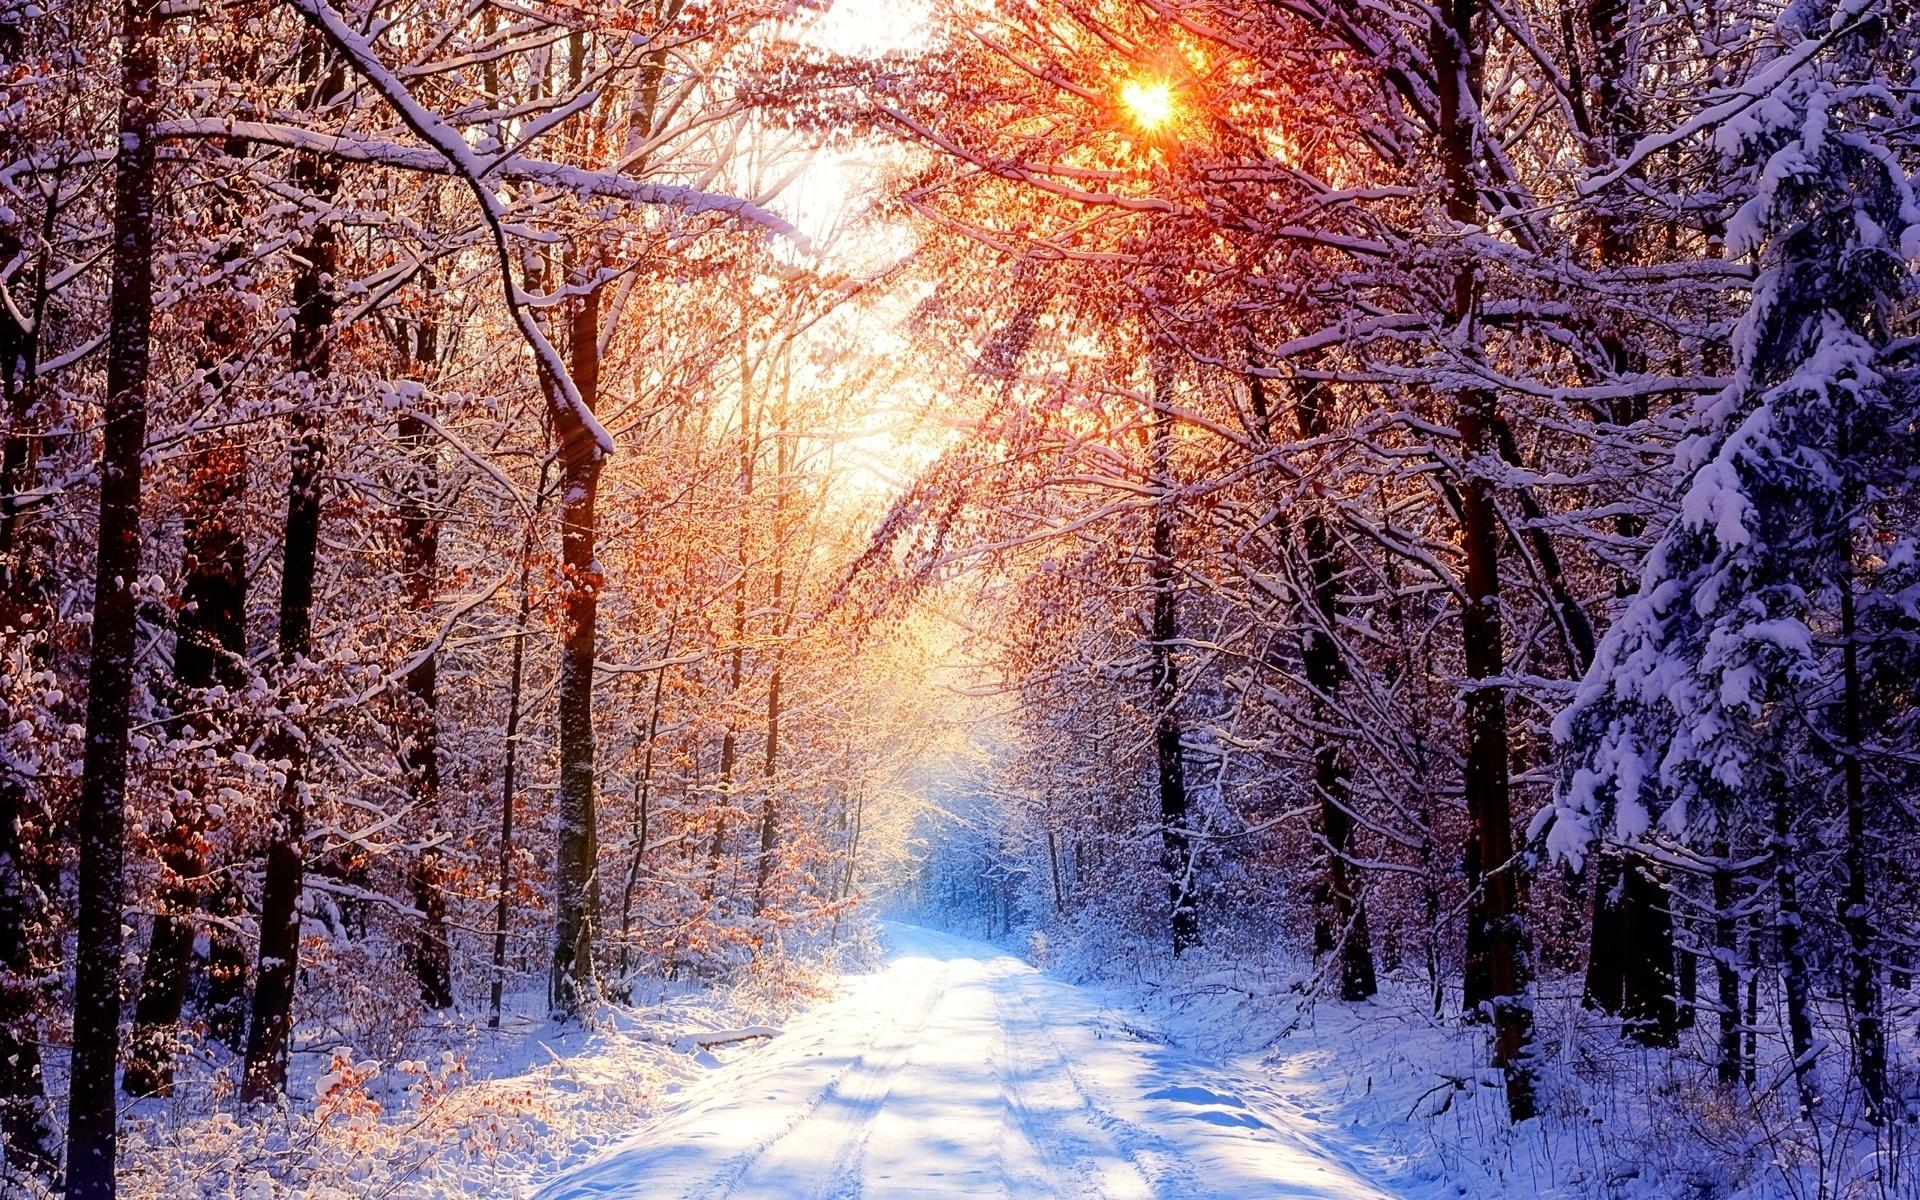 Winter Winter trees 1920x1200